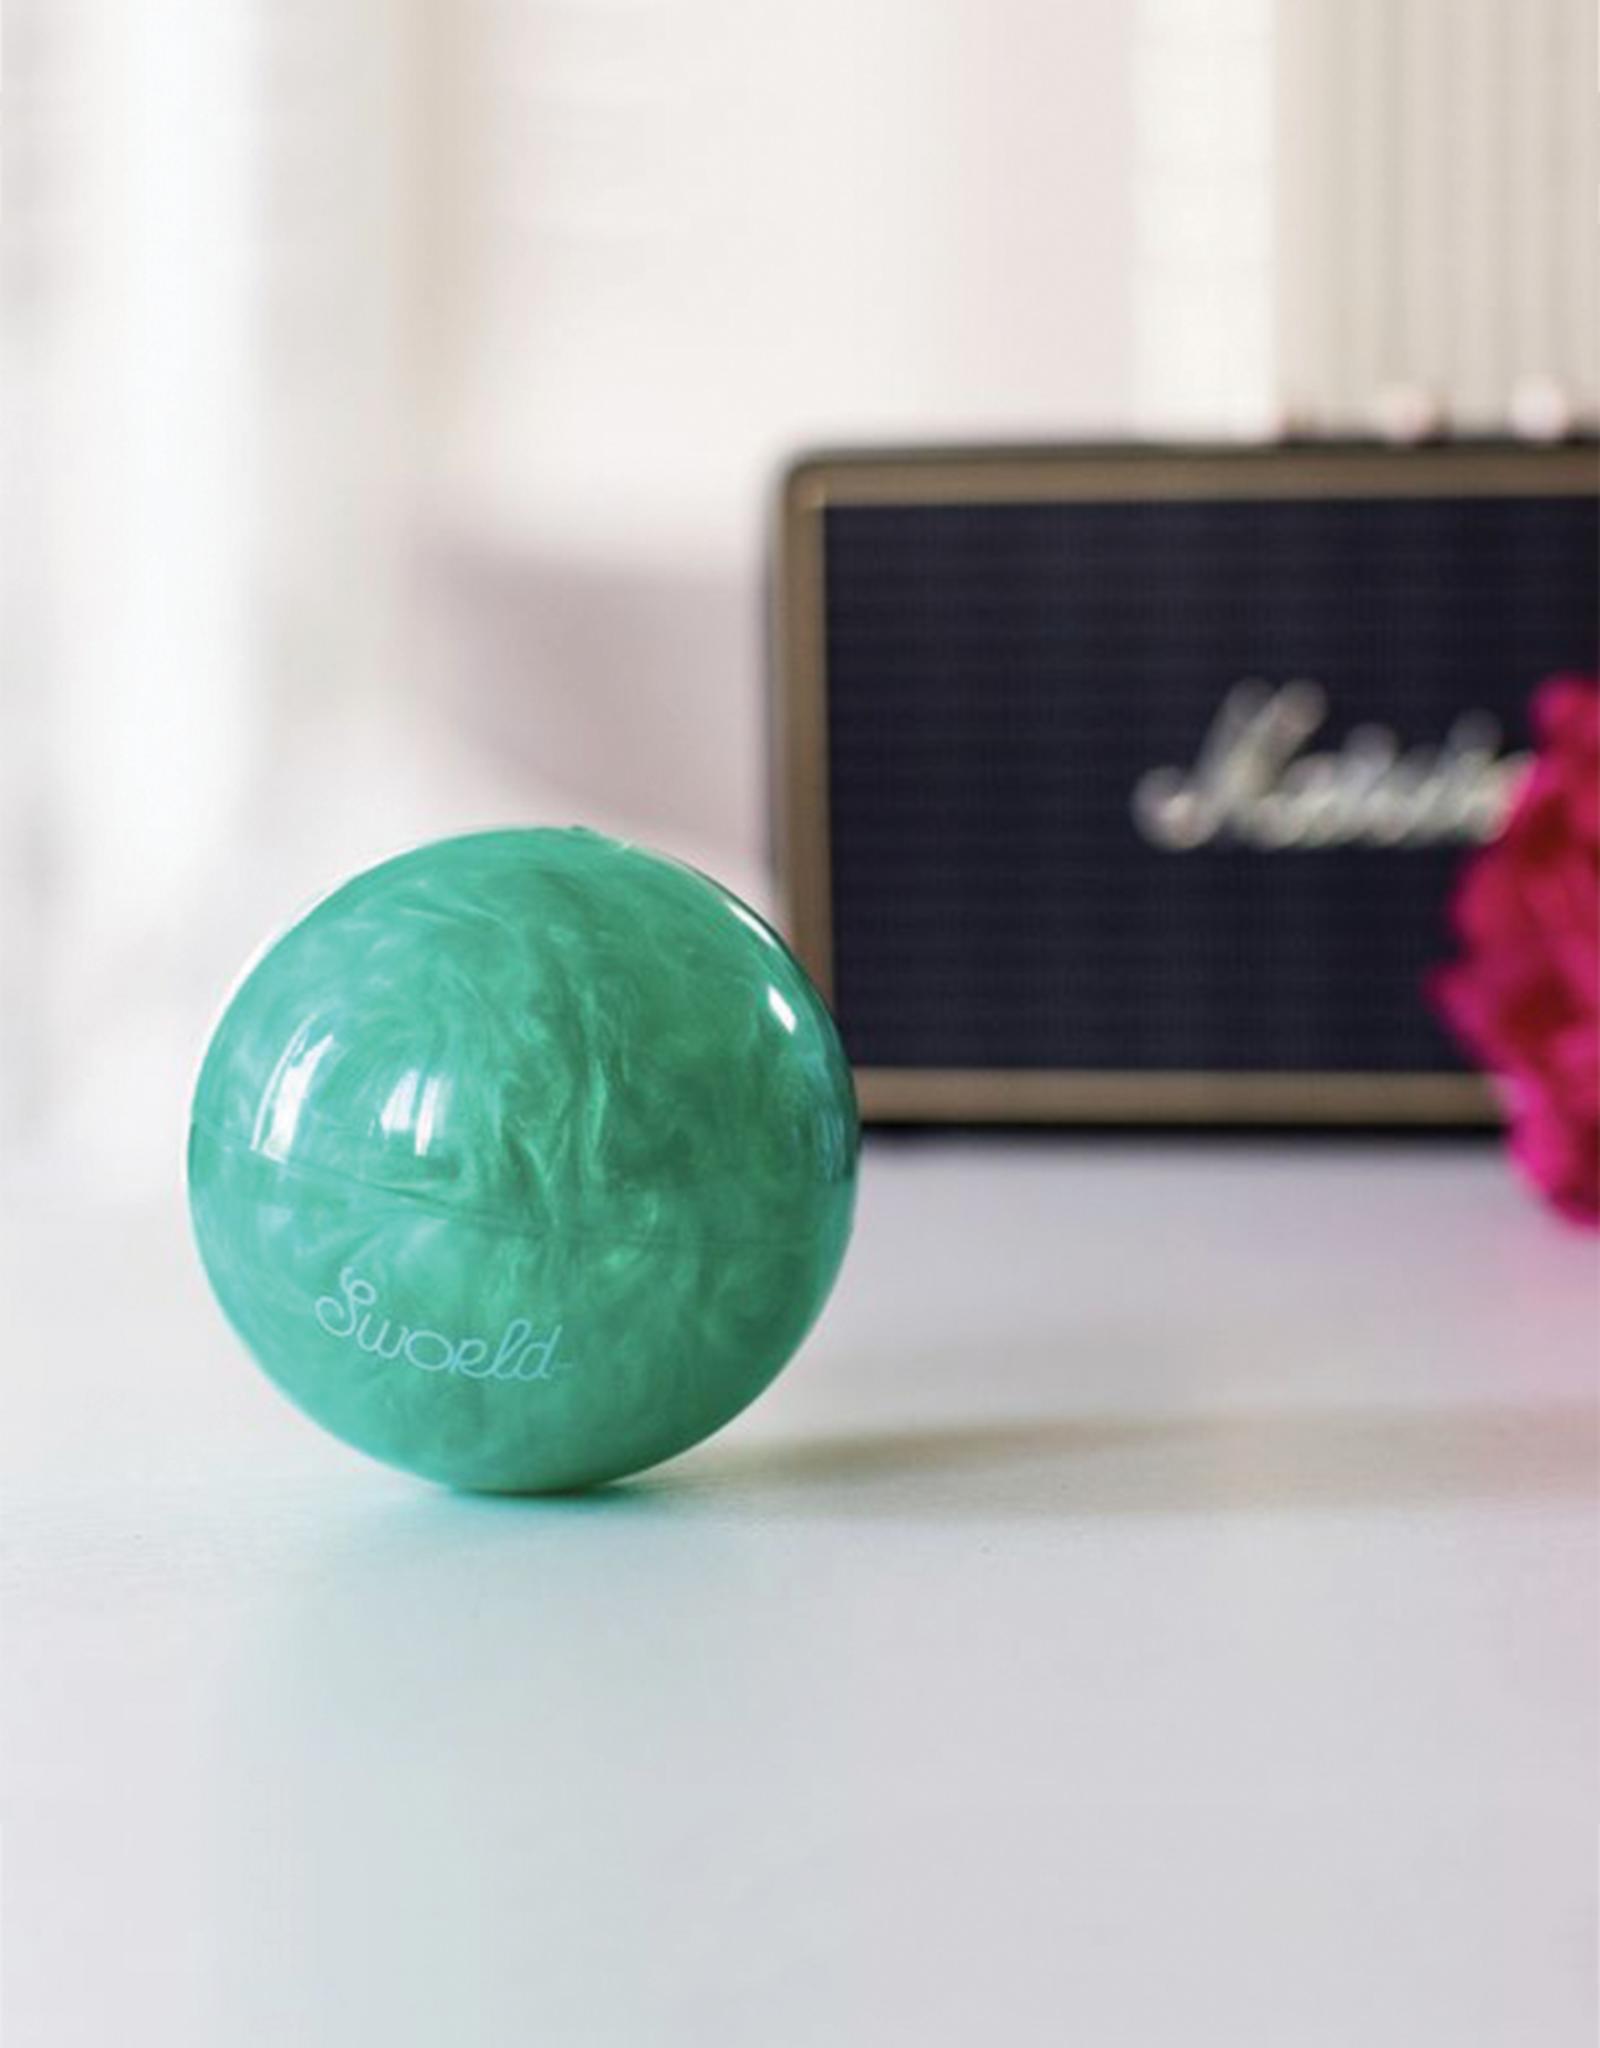 Copernicus Toys Sworld Venus:  Green Orb